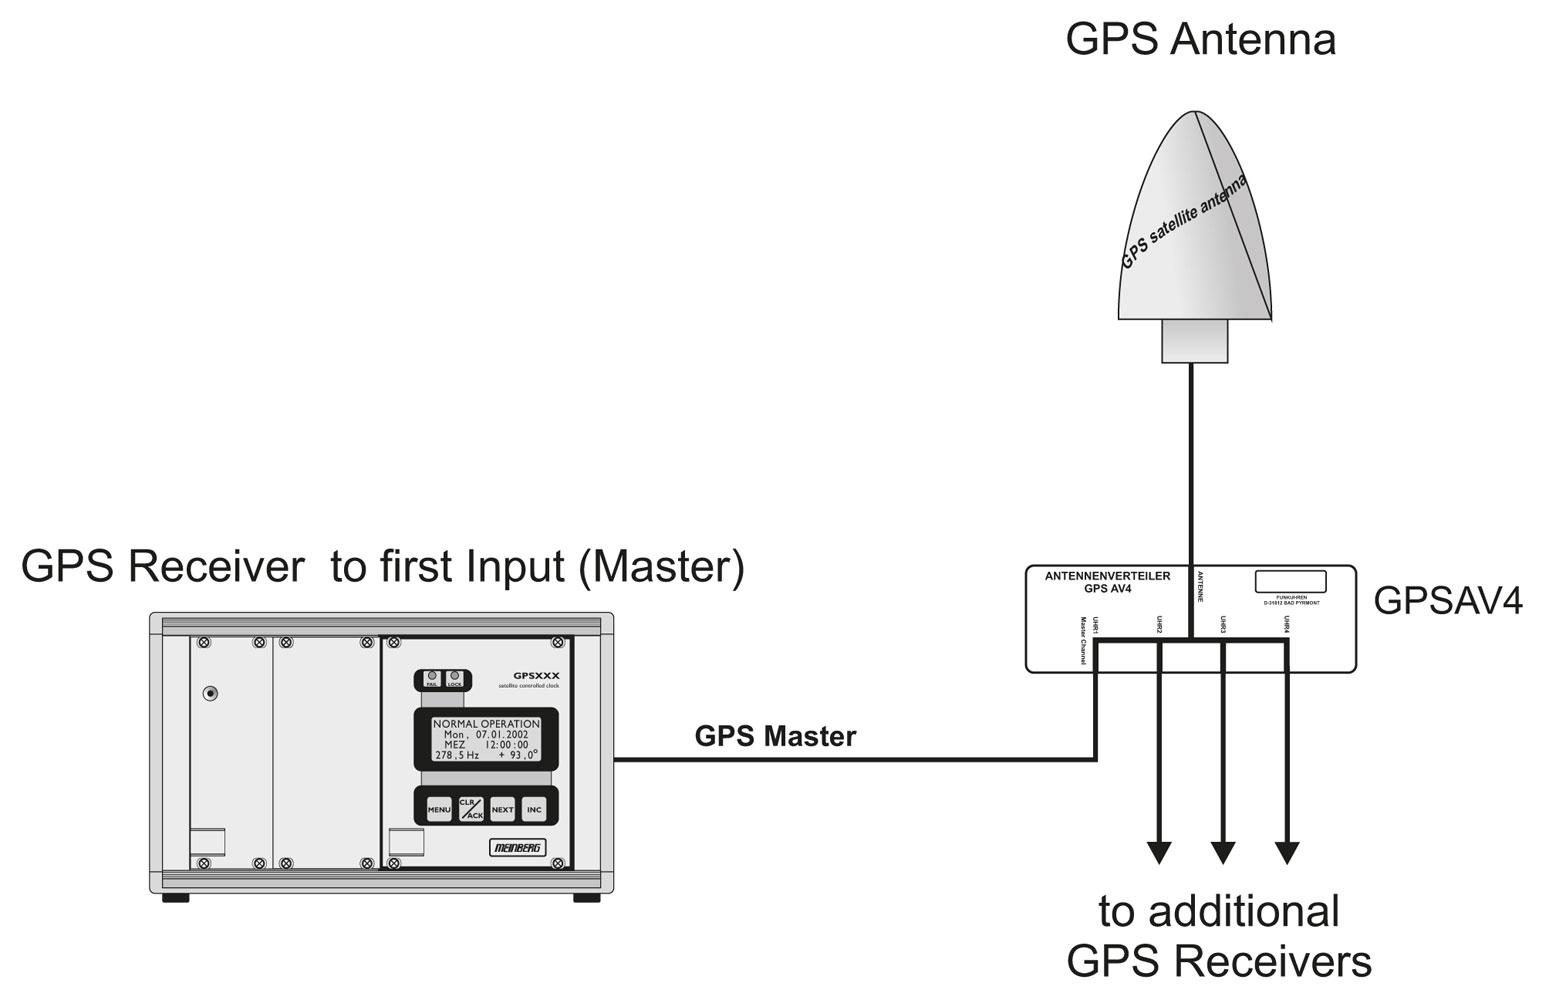 Application of the GPS Antenna Distributor